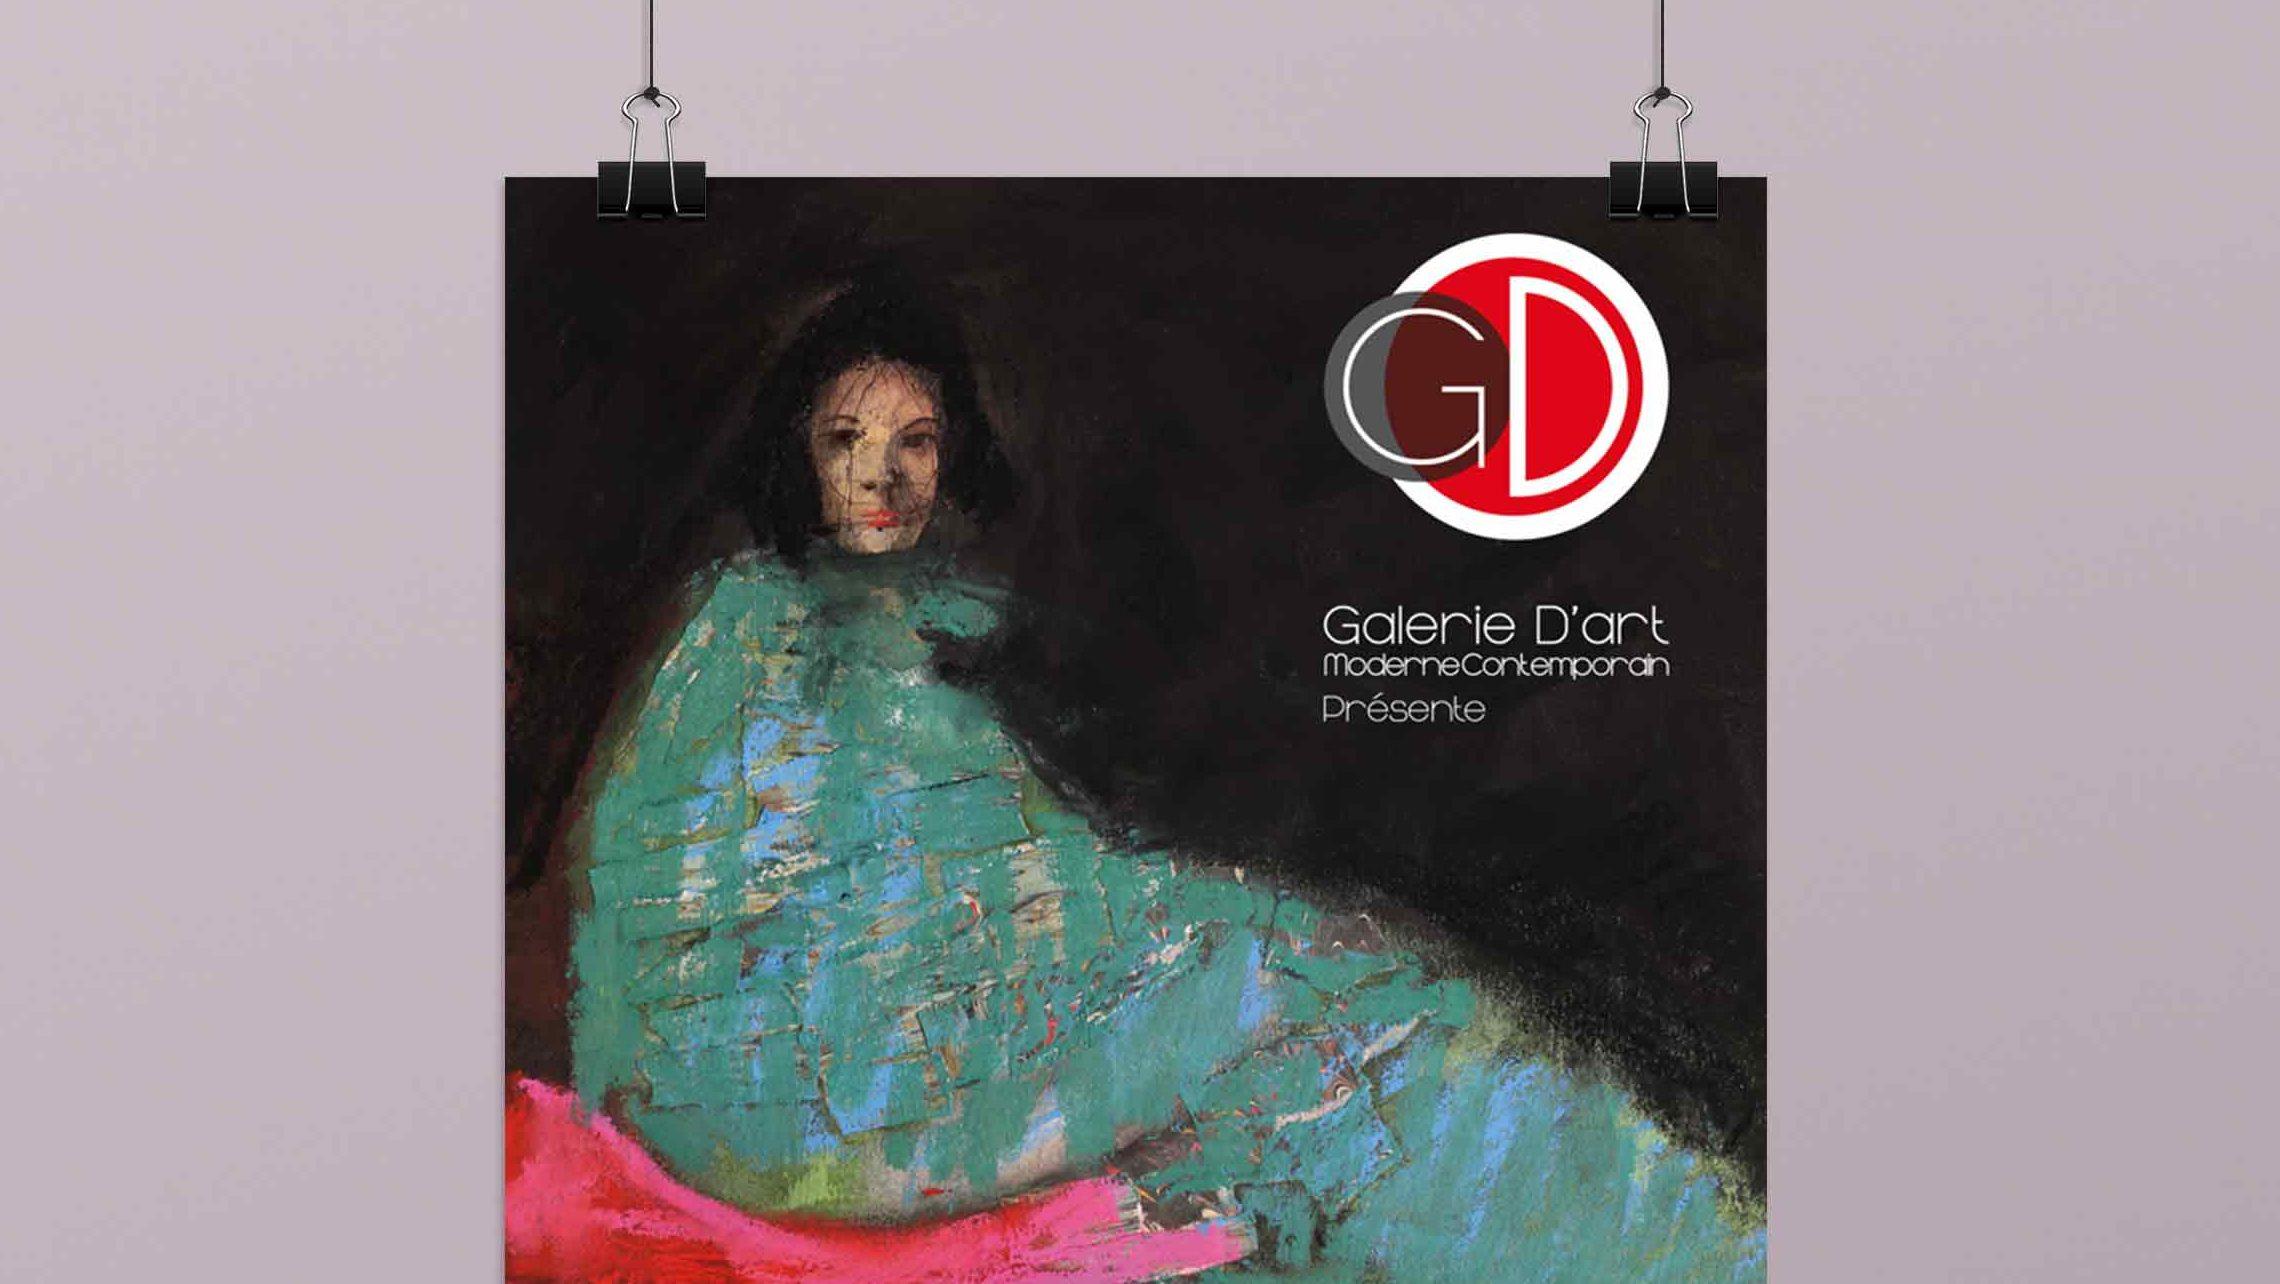 3 – Galerie GD